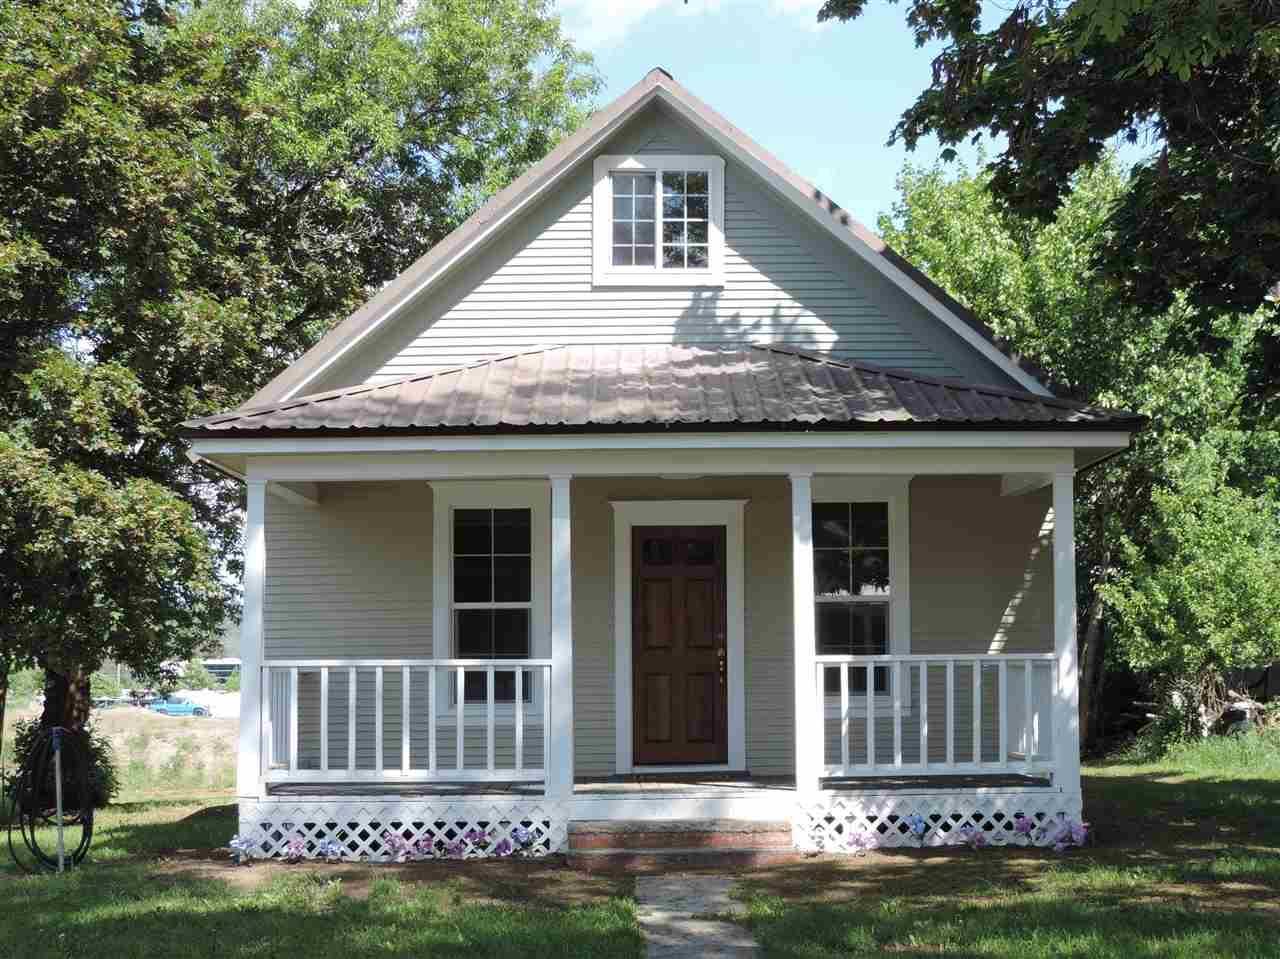 410 N Washington Ave, Newport, WA 99156 (#201817898) :: Five Star Real Estate Group